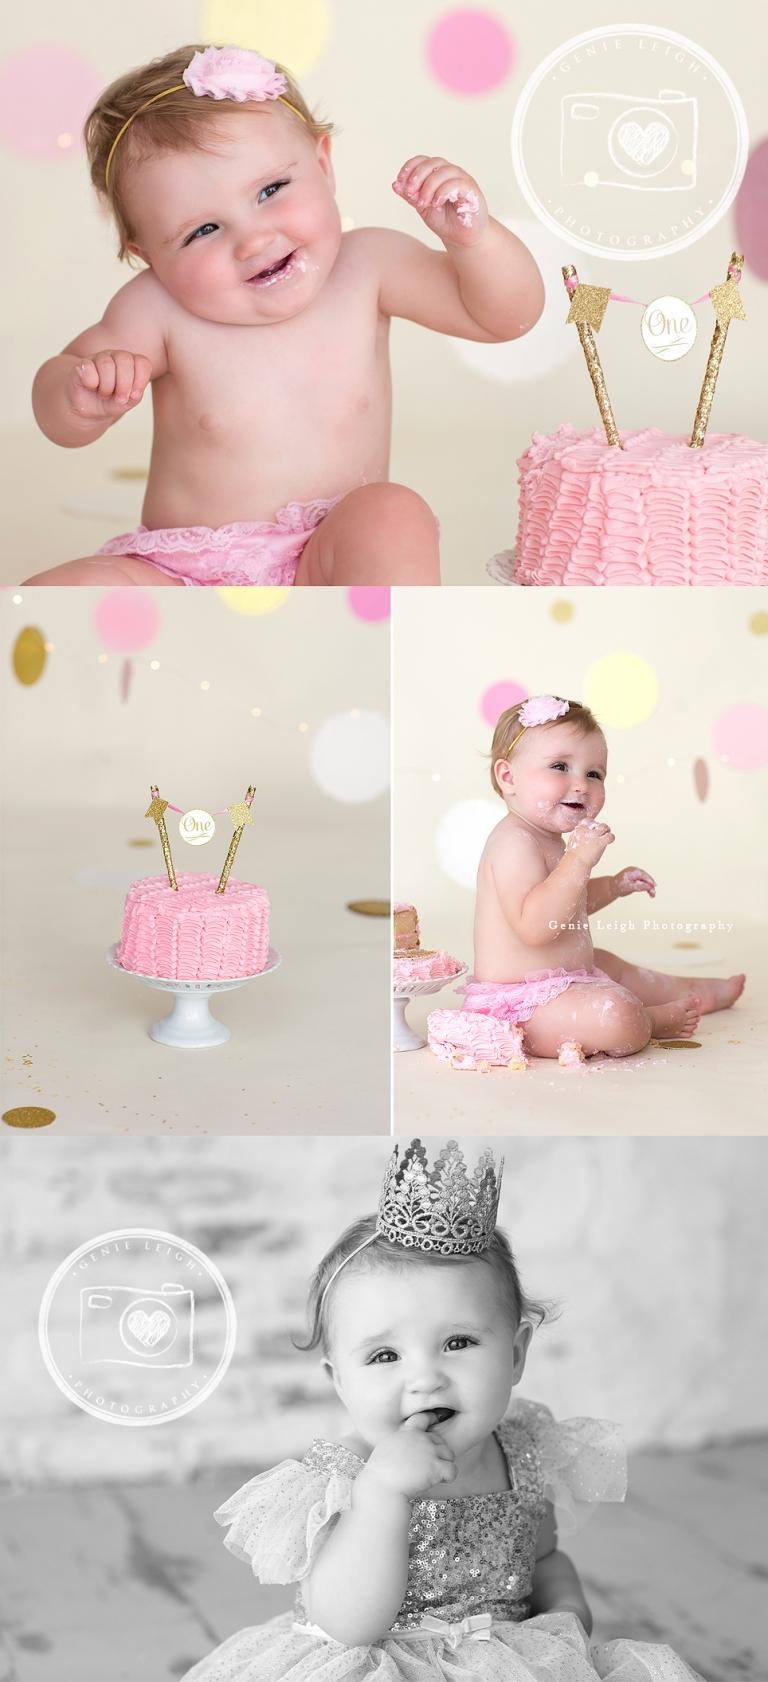 Genie Leigh Photography Cake Smash Baby GIrl Pink & Gold Glitter Studio